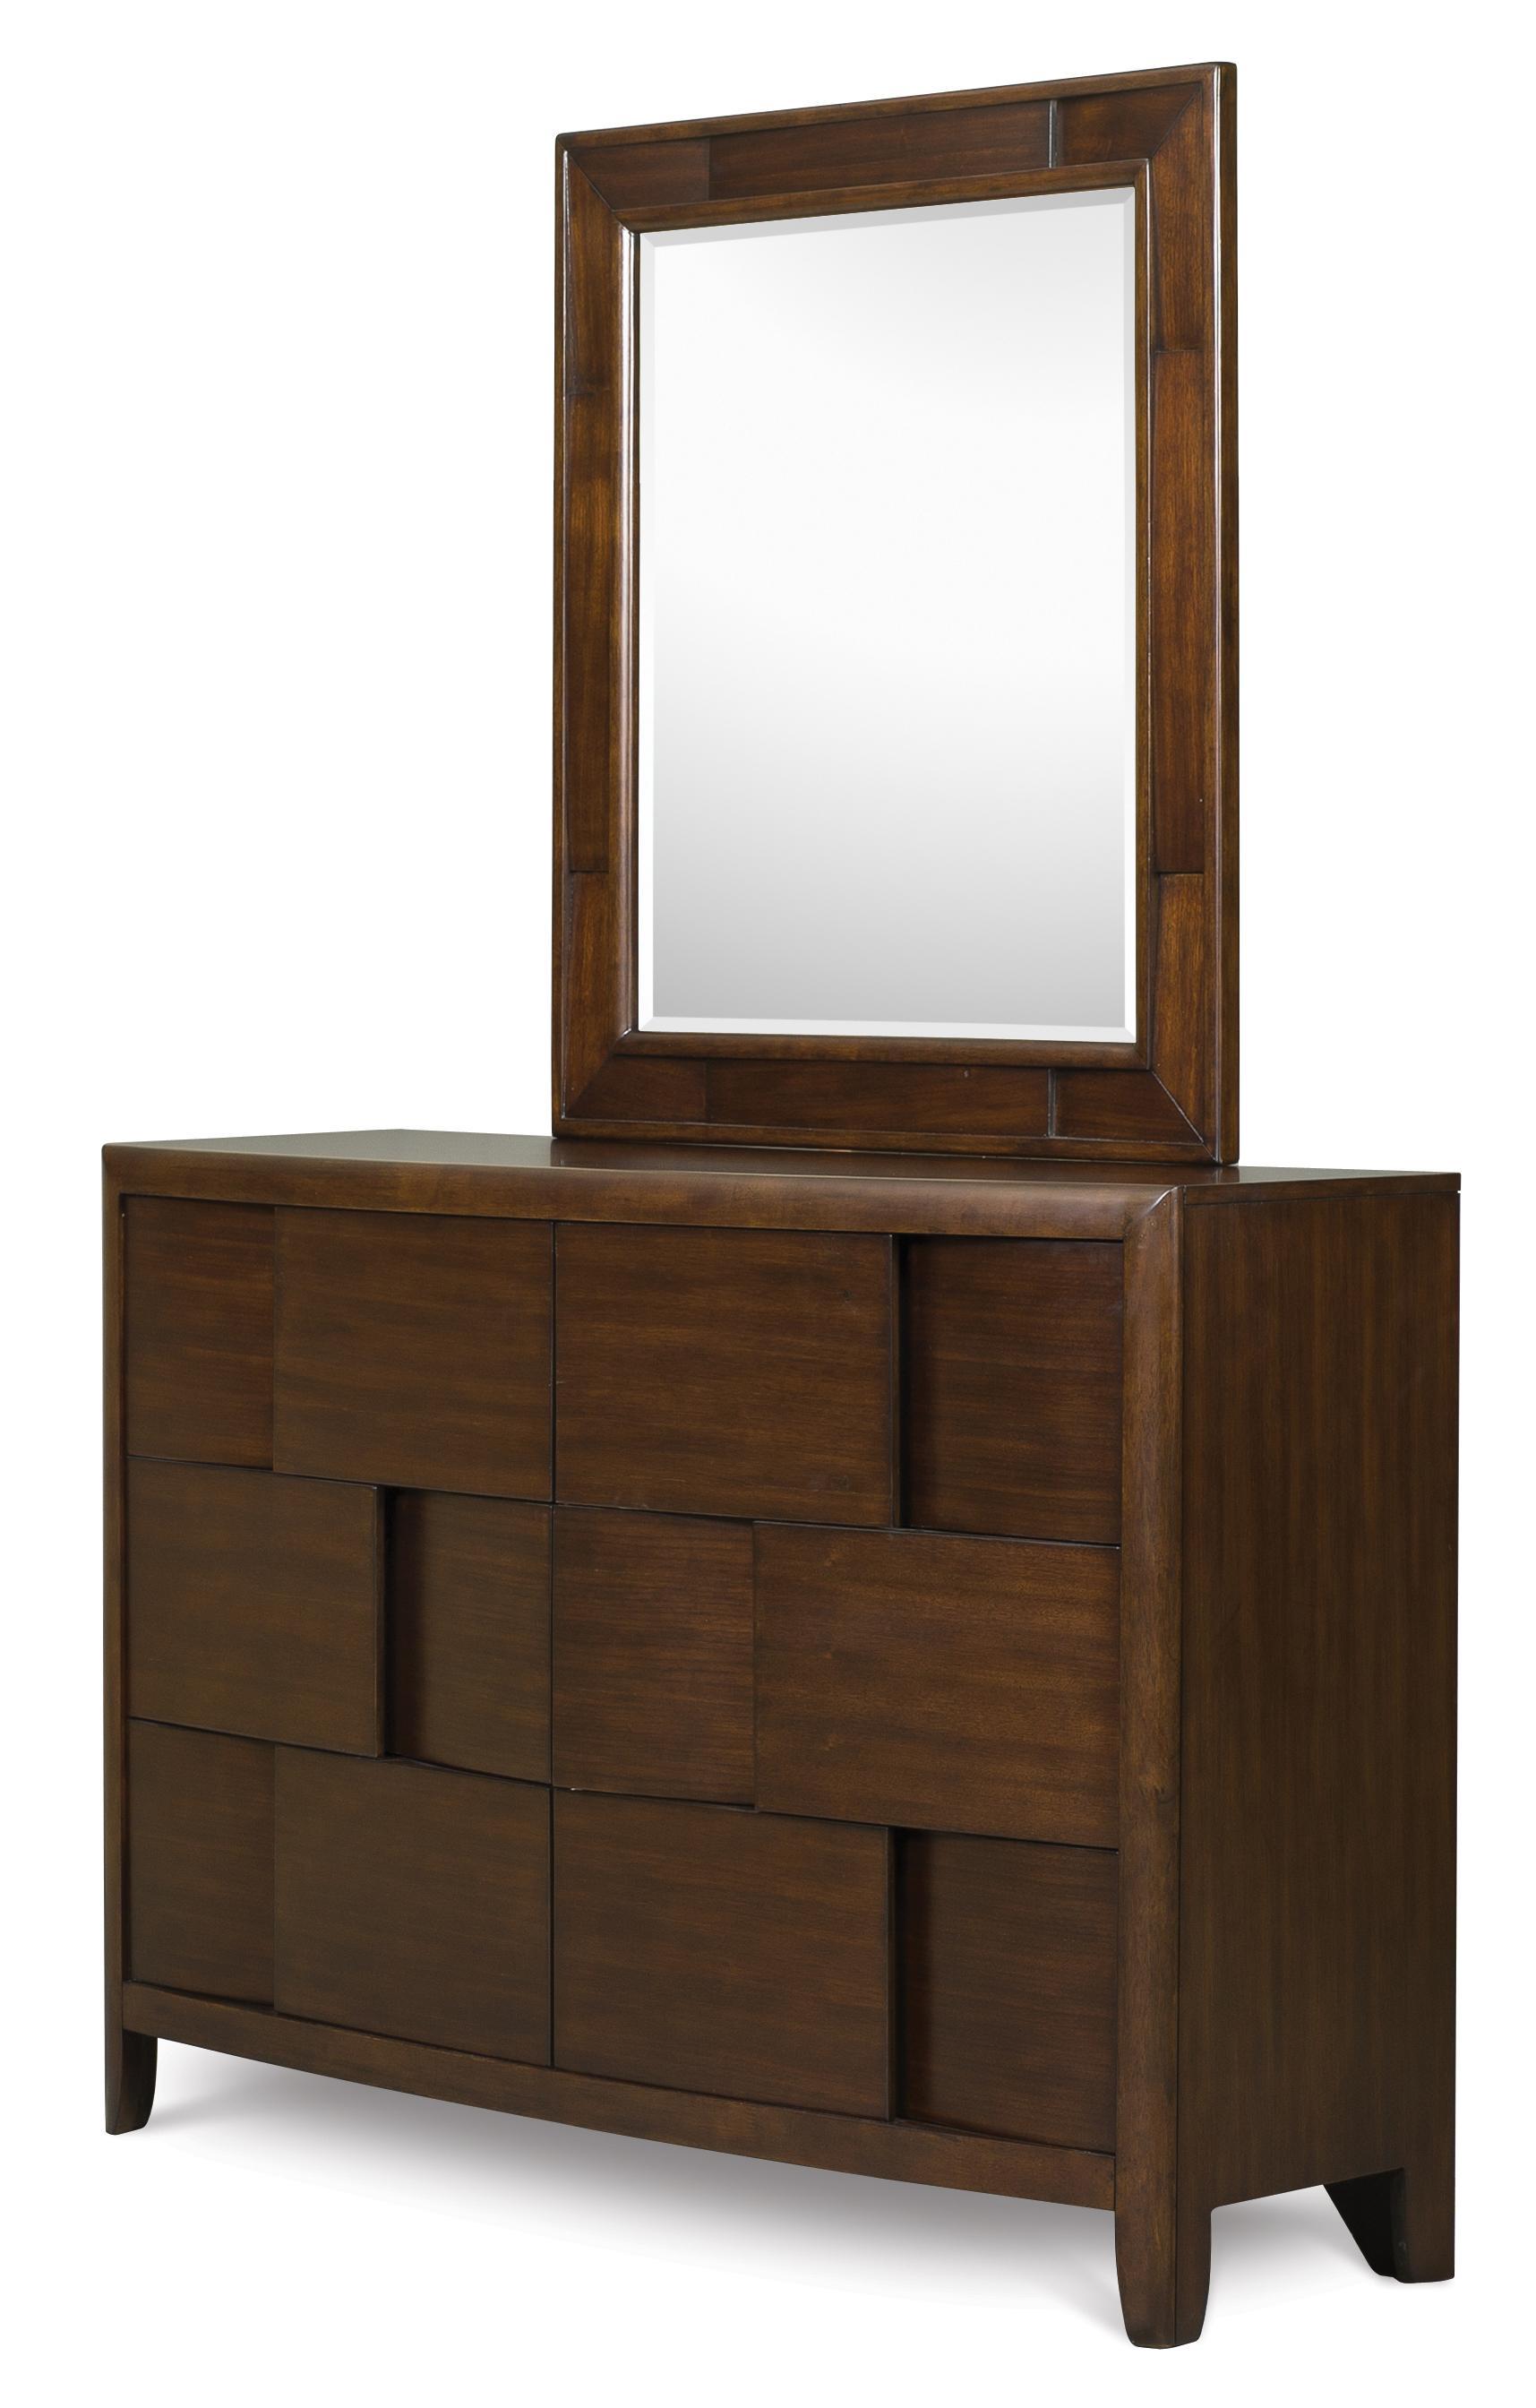 Belfort Select Youth Twilight  Drawer Dresser & Portrait Mirror - Item Number: Y1876-20/42